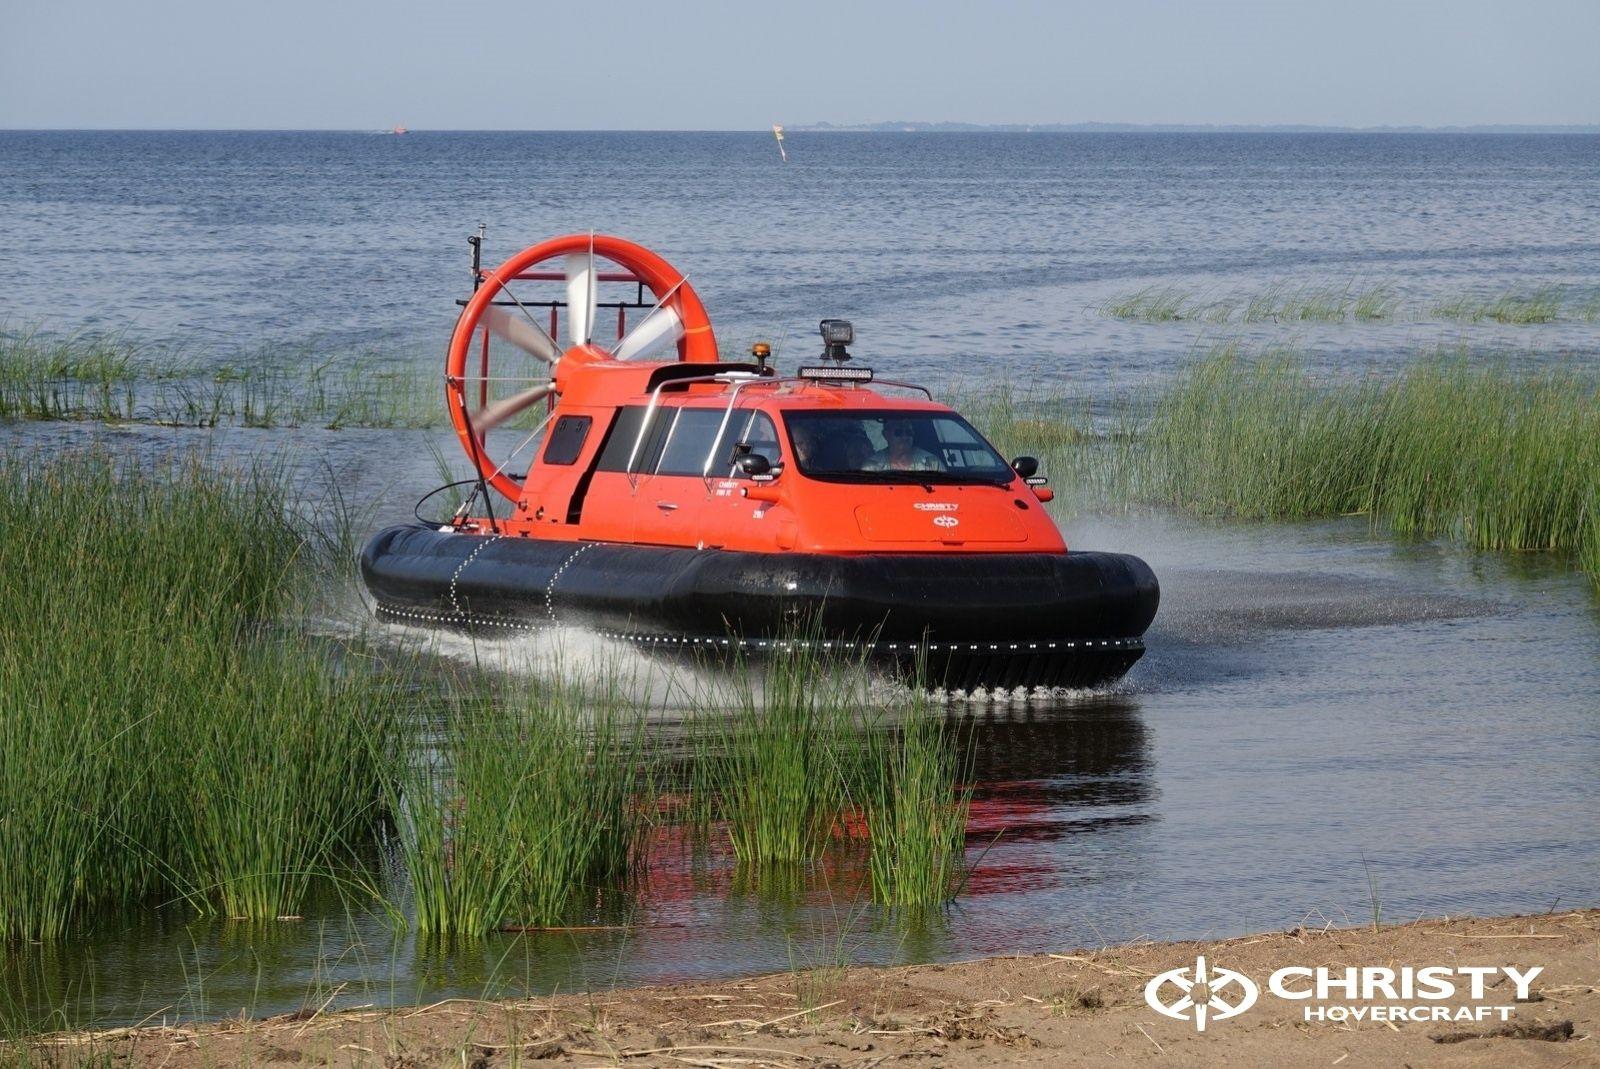 Тест-драйв катера-амфибии Christy 8186 FC Duct для правительства Канады   фото №1